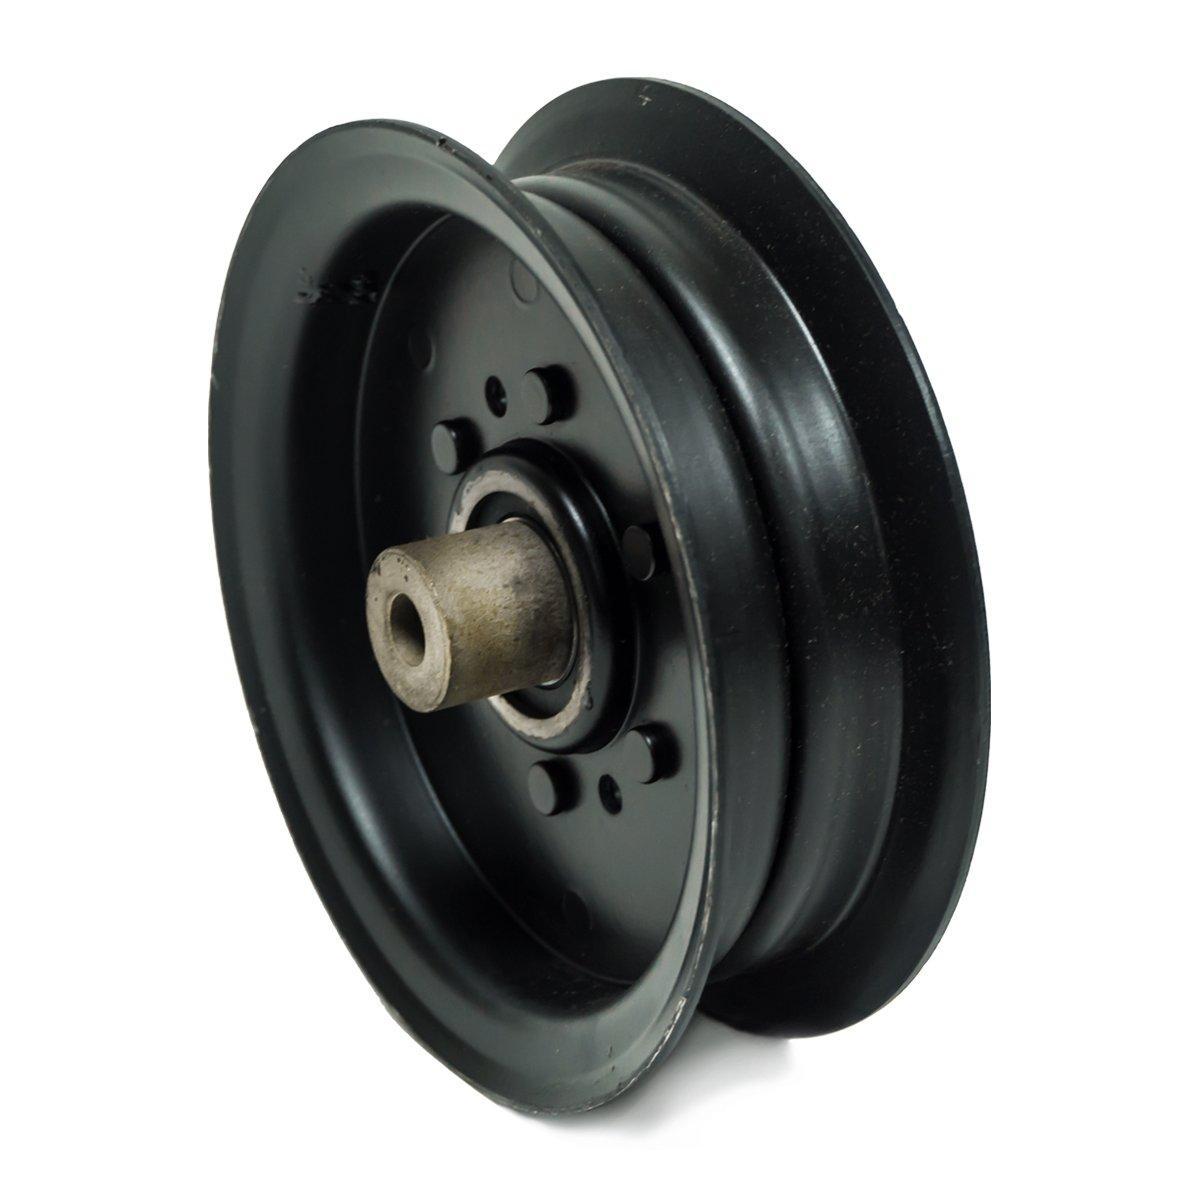 "Husqvarna YTH 20 K 46/"" Mower Deck Rebuild Kit Spindles Blades Belt Pulleys/&Bolts"